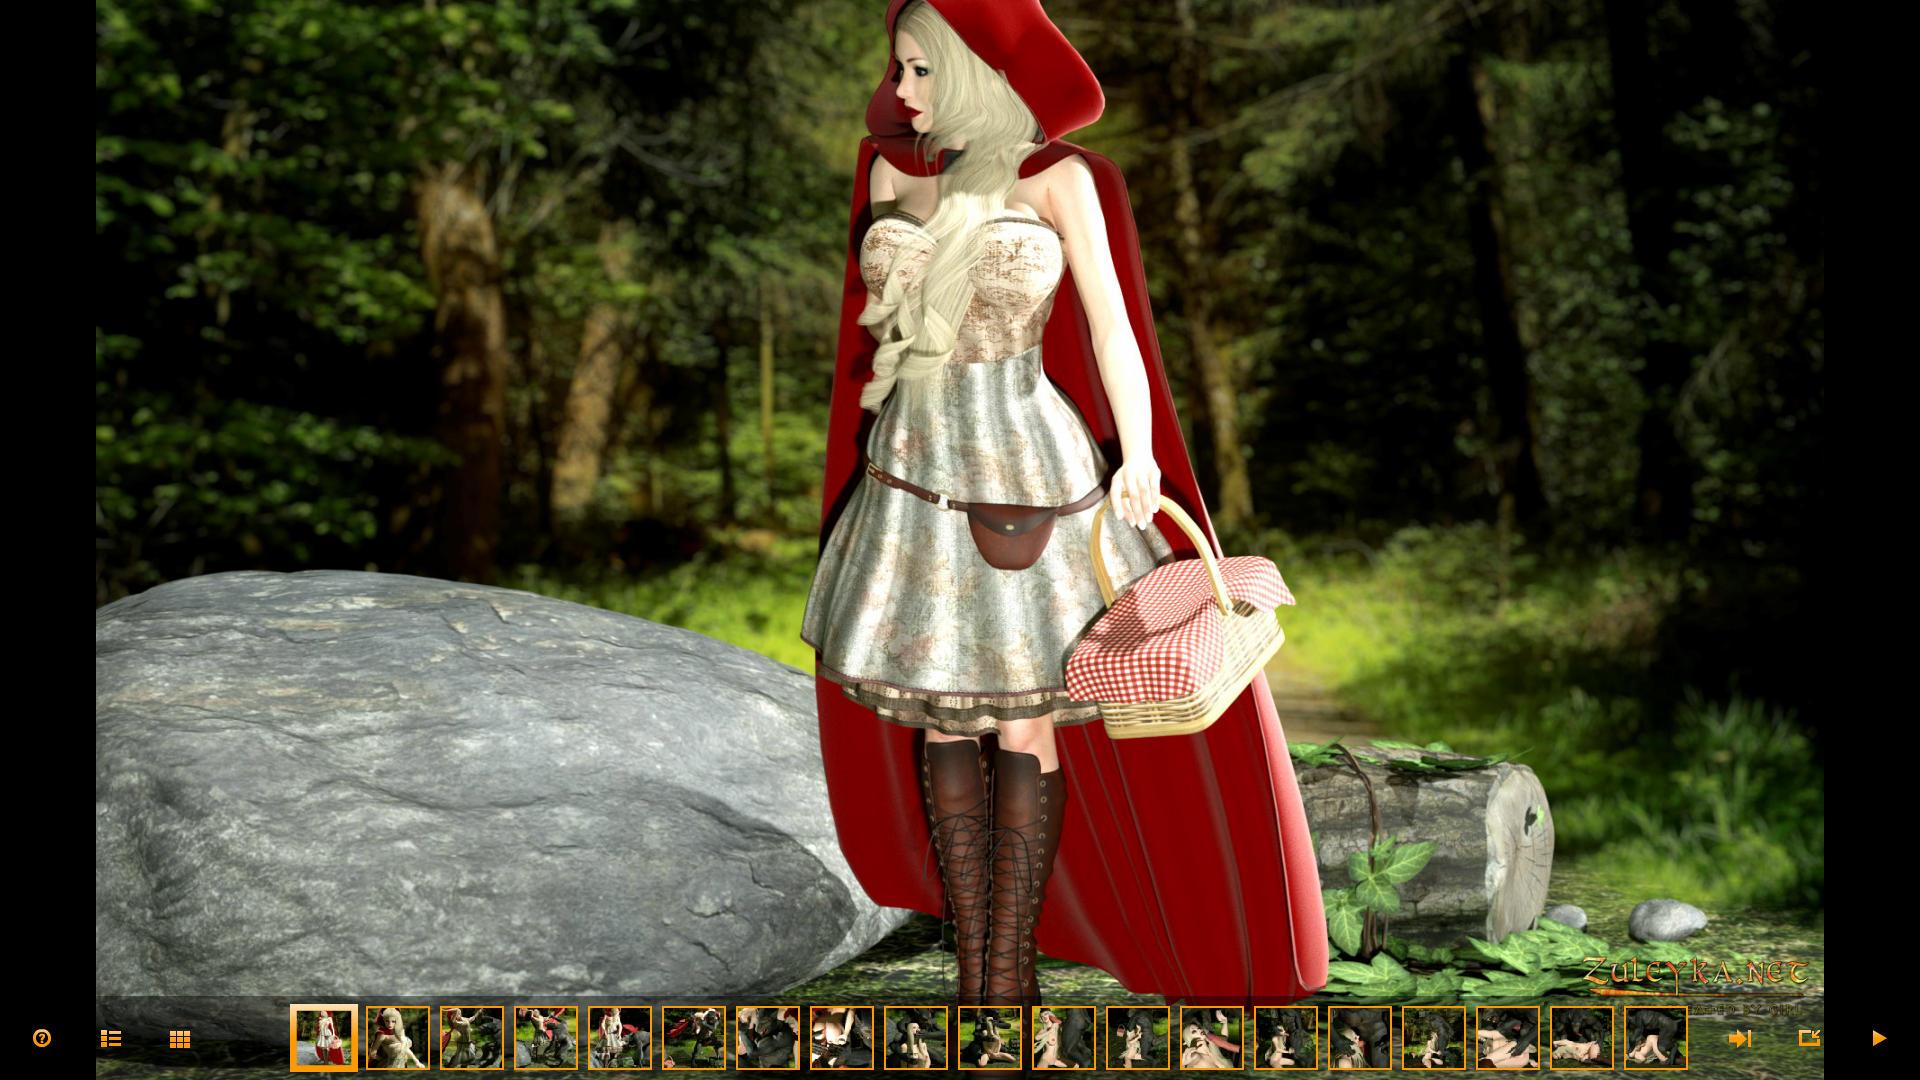 SureFap xxx porno Little Red Riding Hood - [Zuleyka] - Red Riding Hood In The Adult World